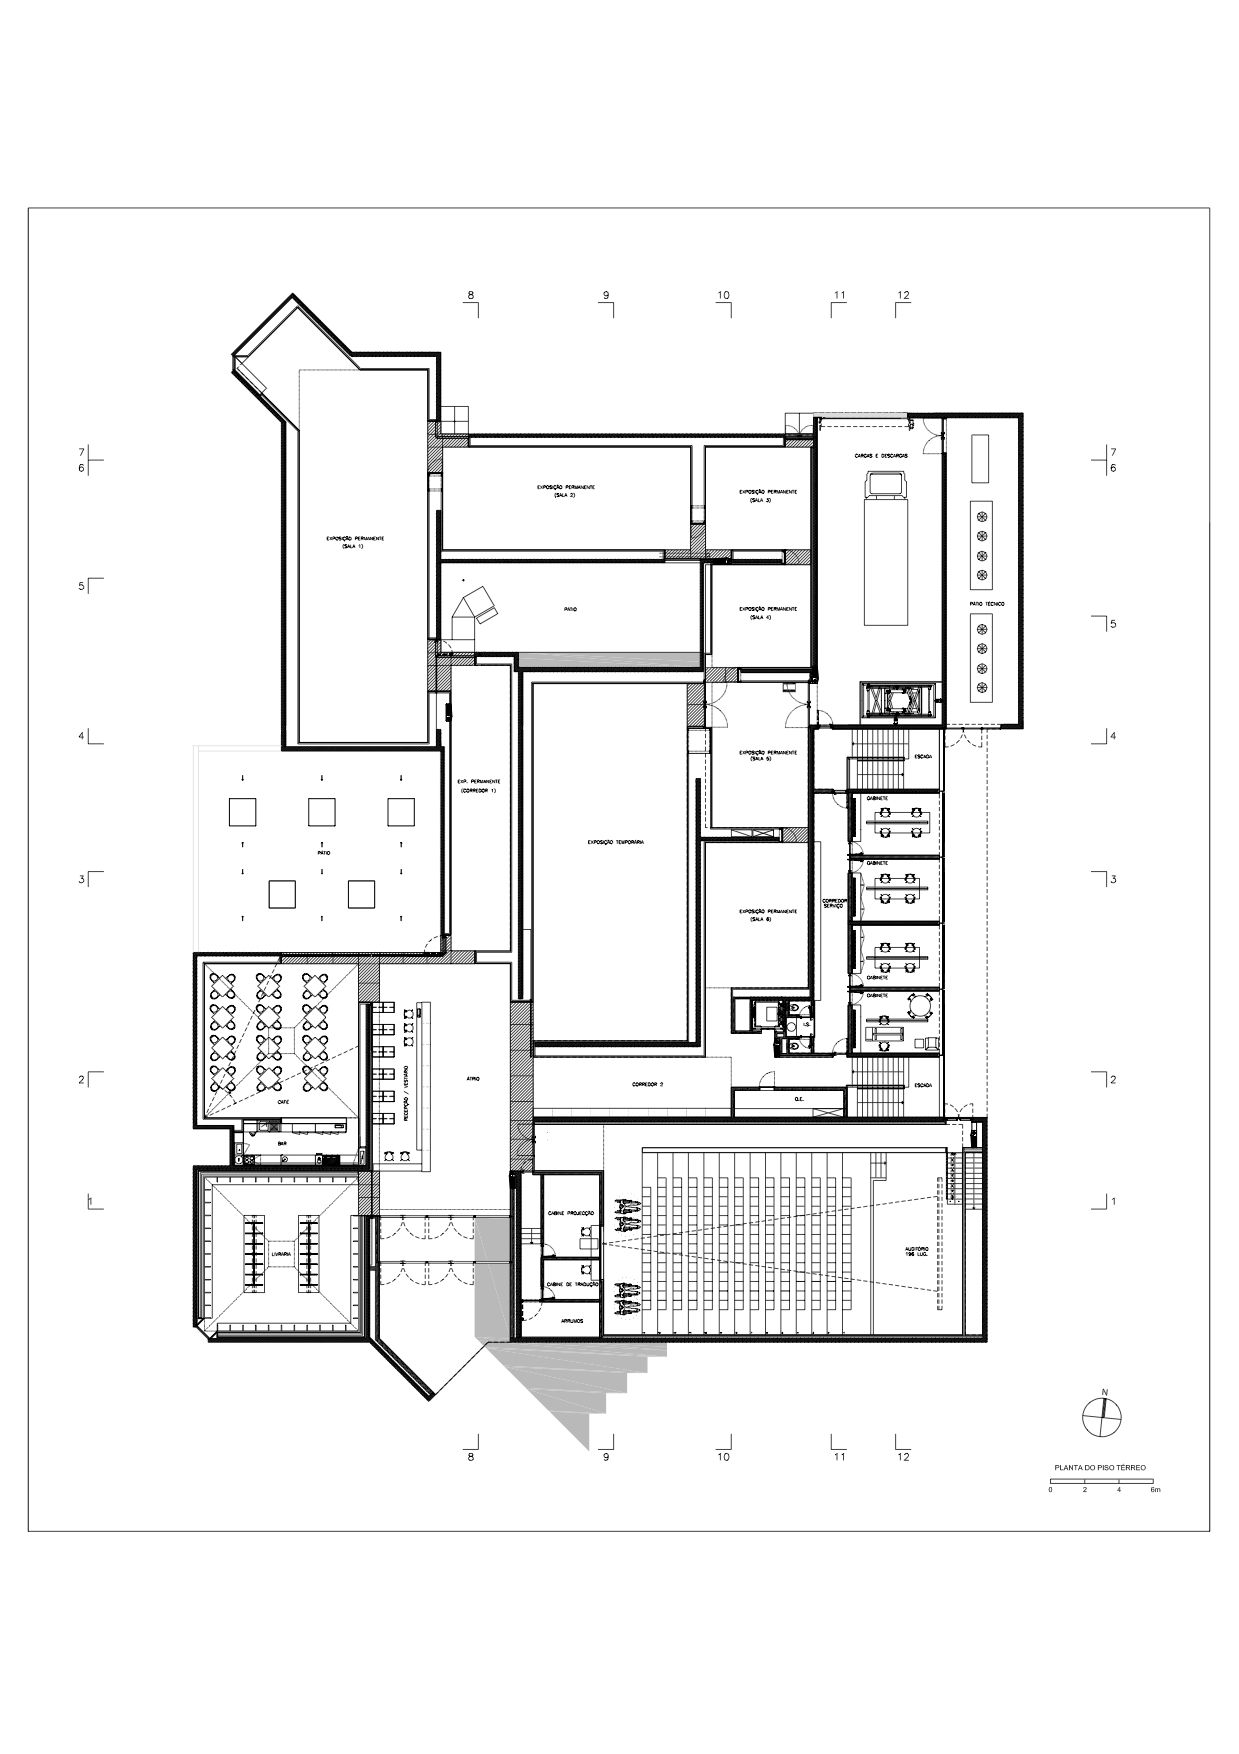 Casa Das Historias